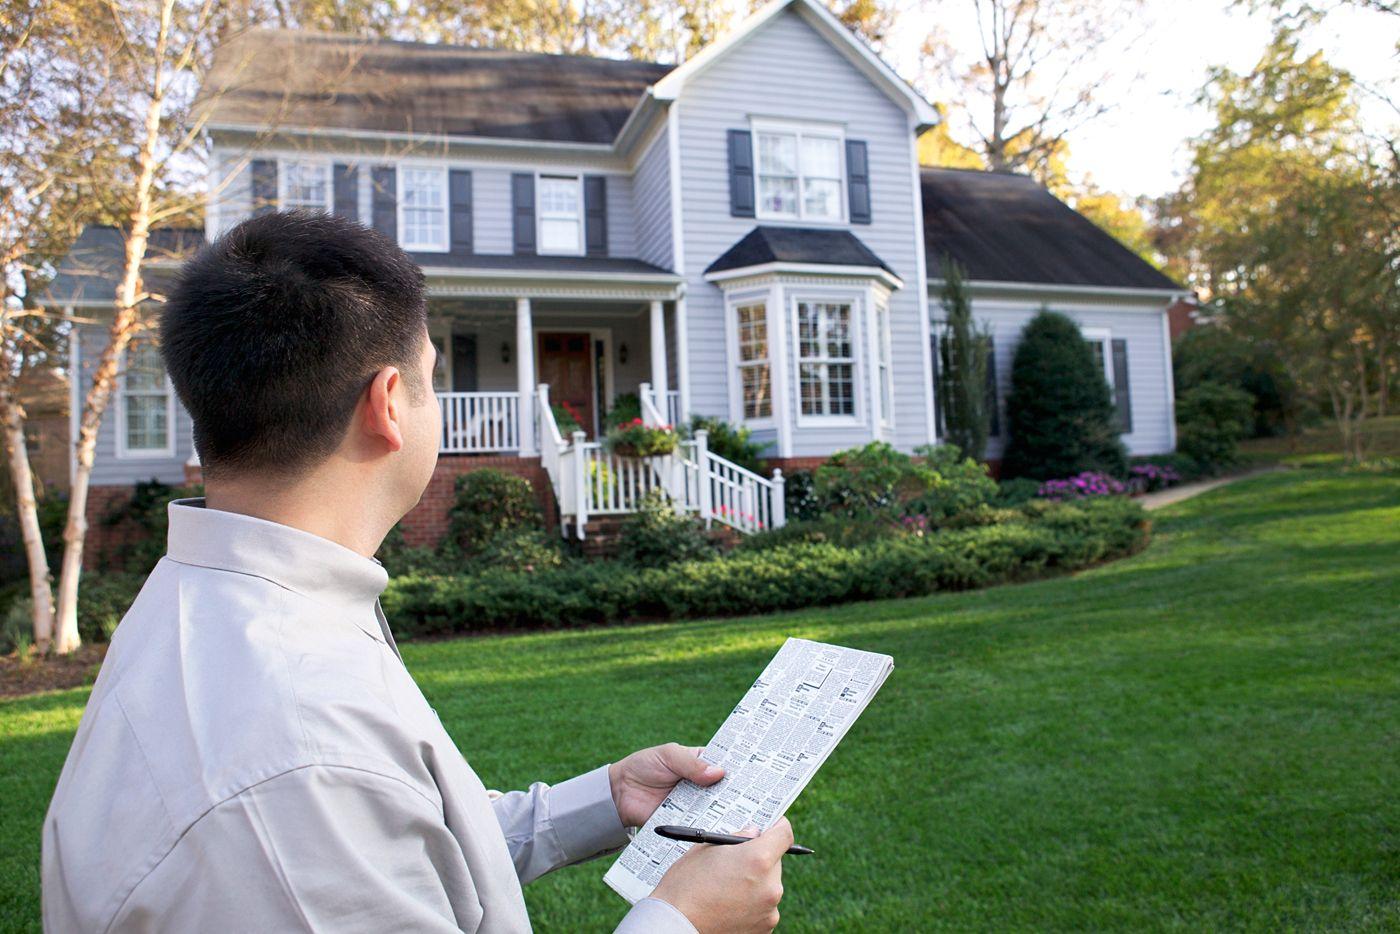 Unemployment-impact-on-US-housing-market